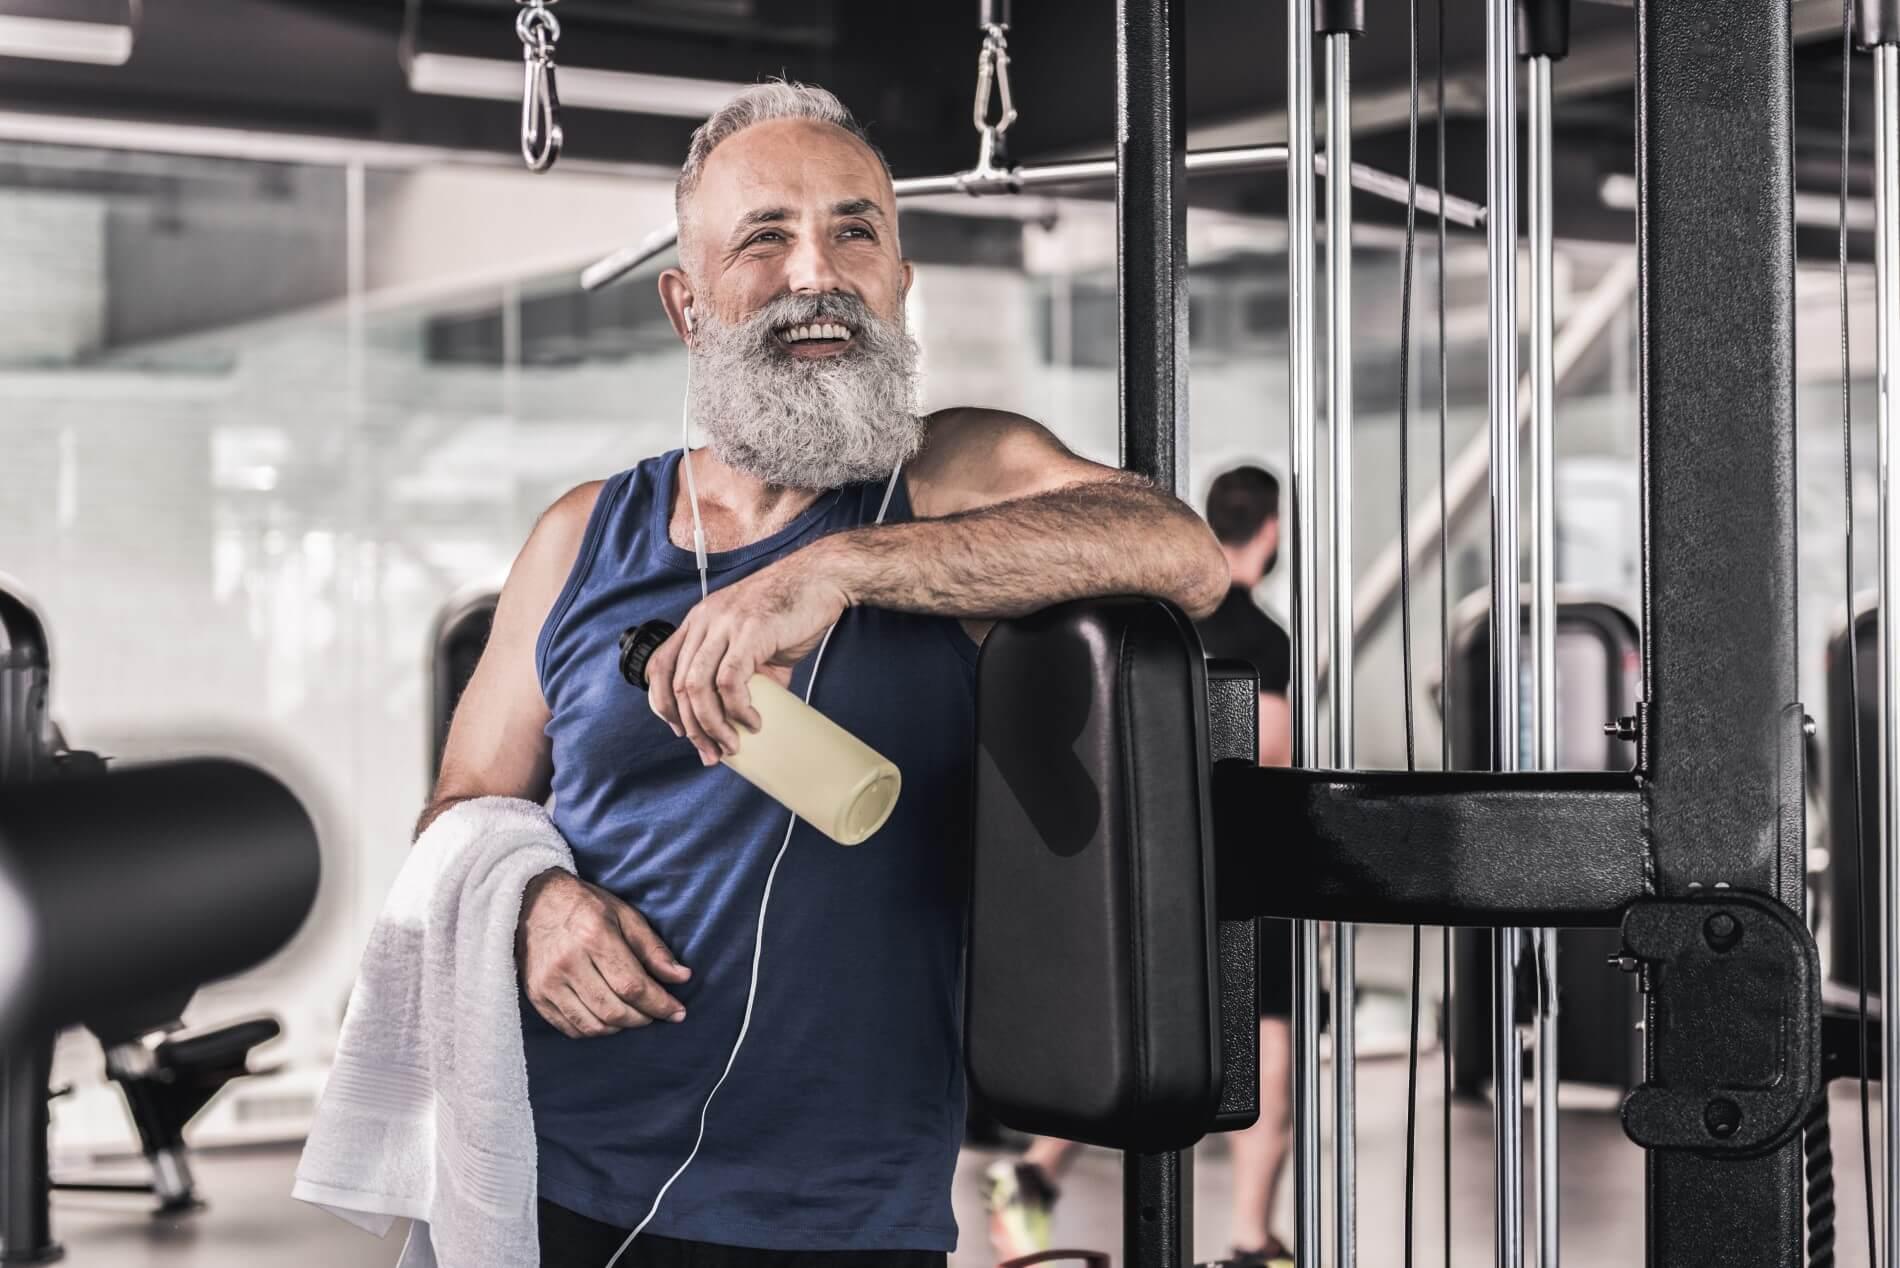 Mann im Fitnesstudio